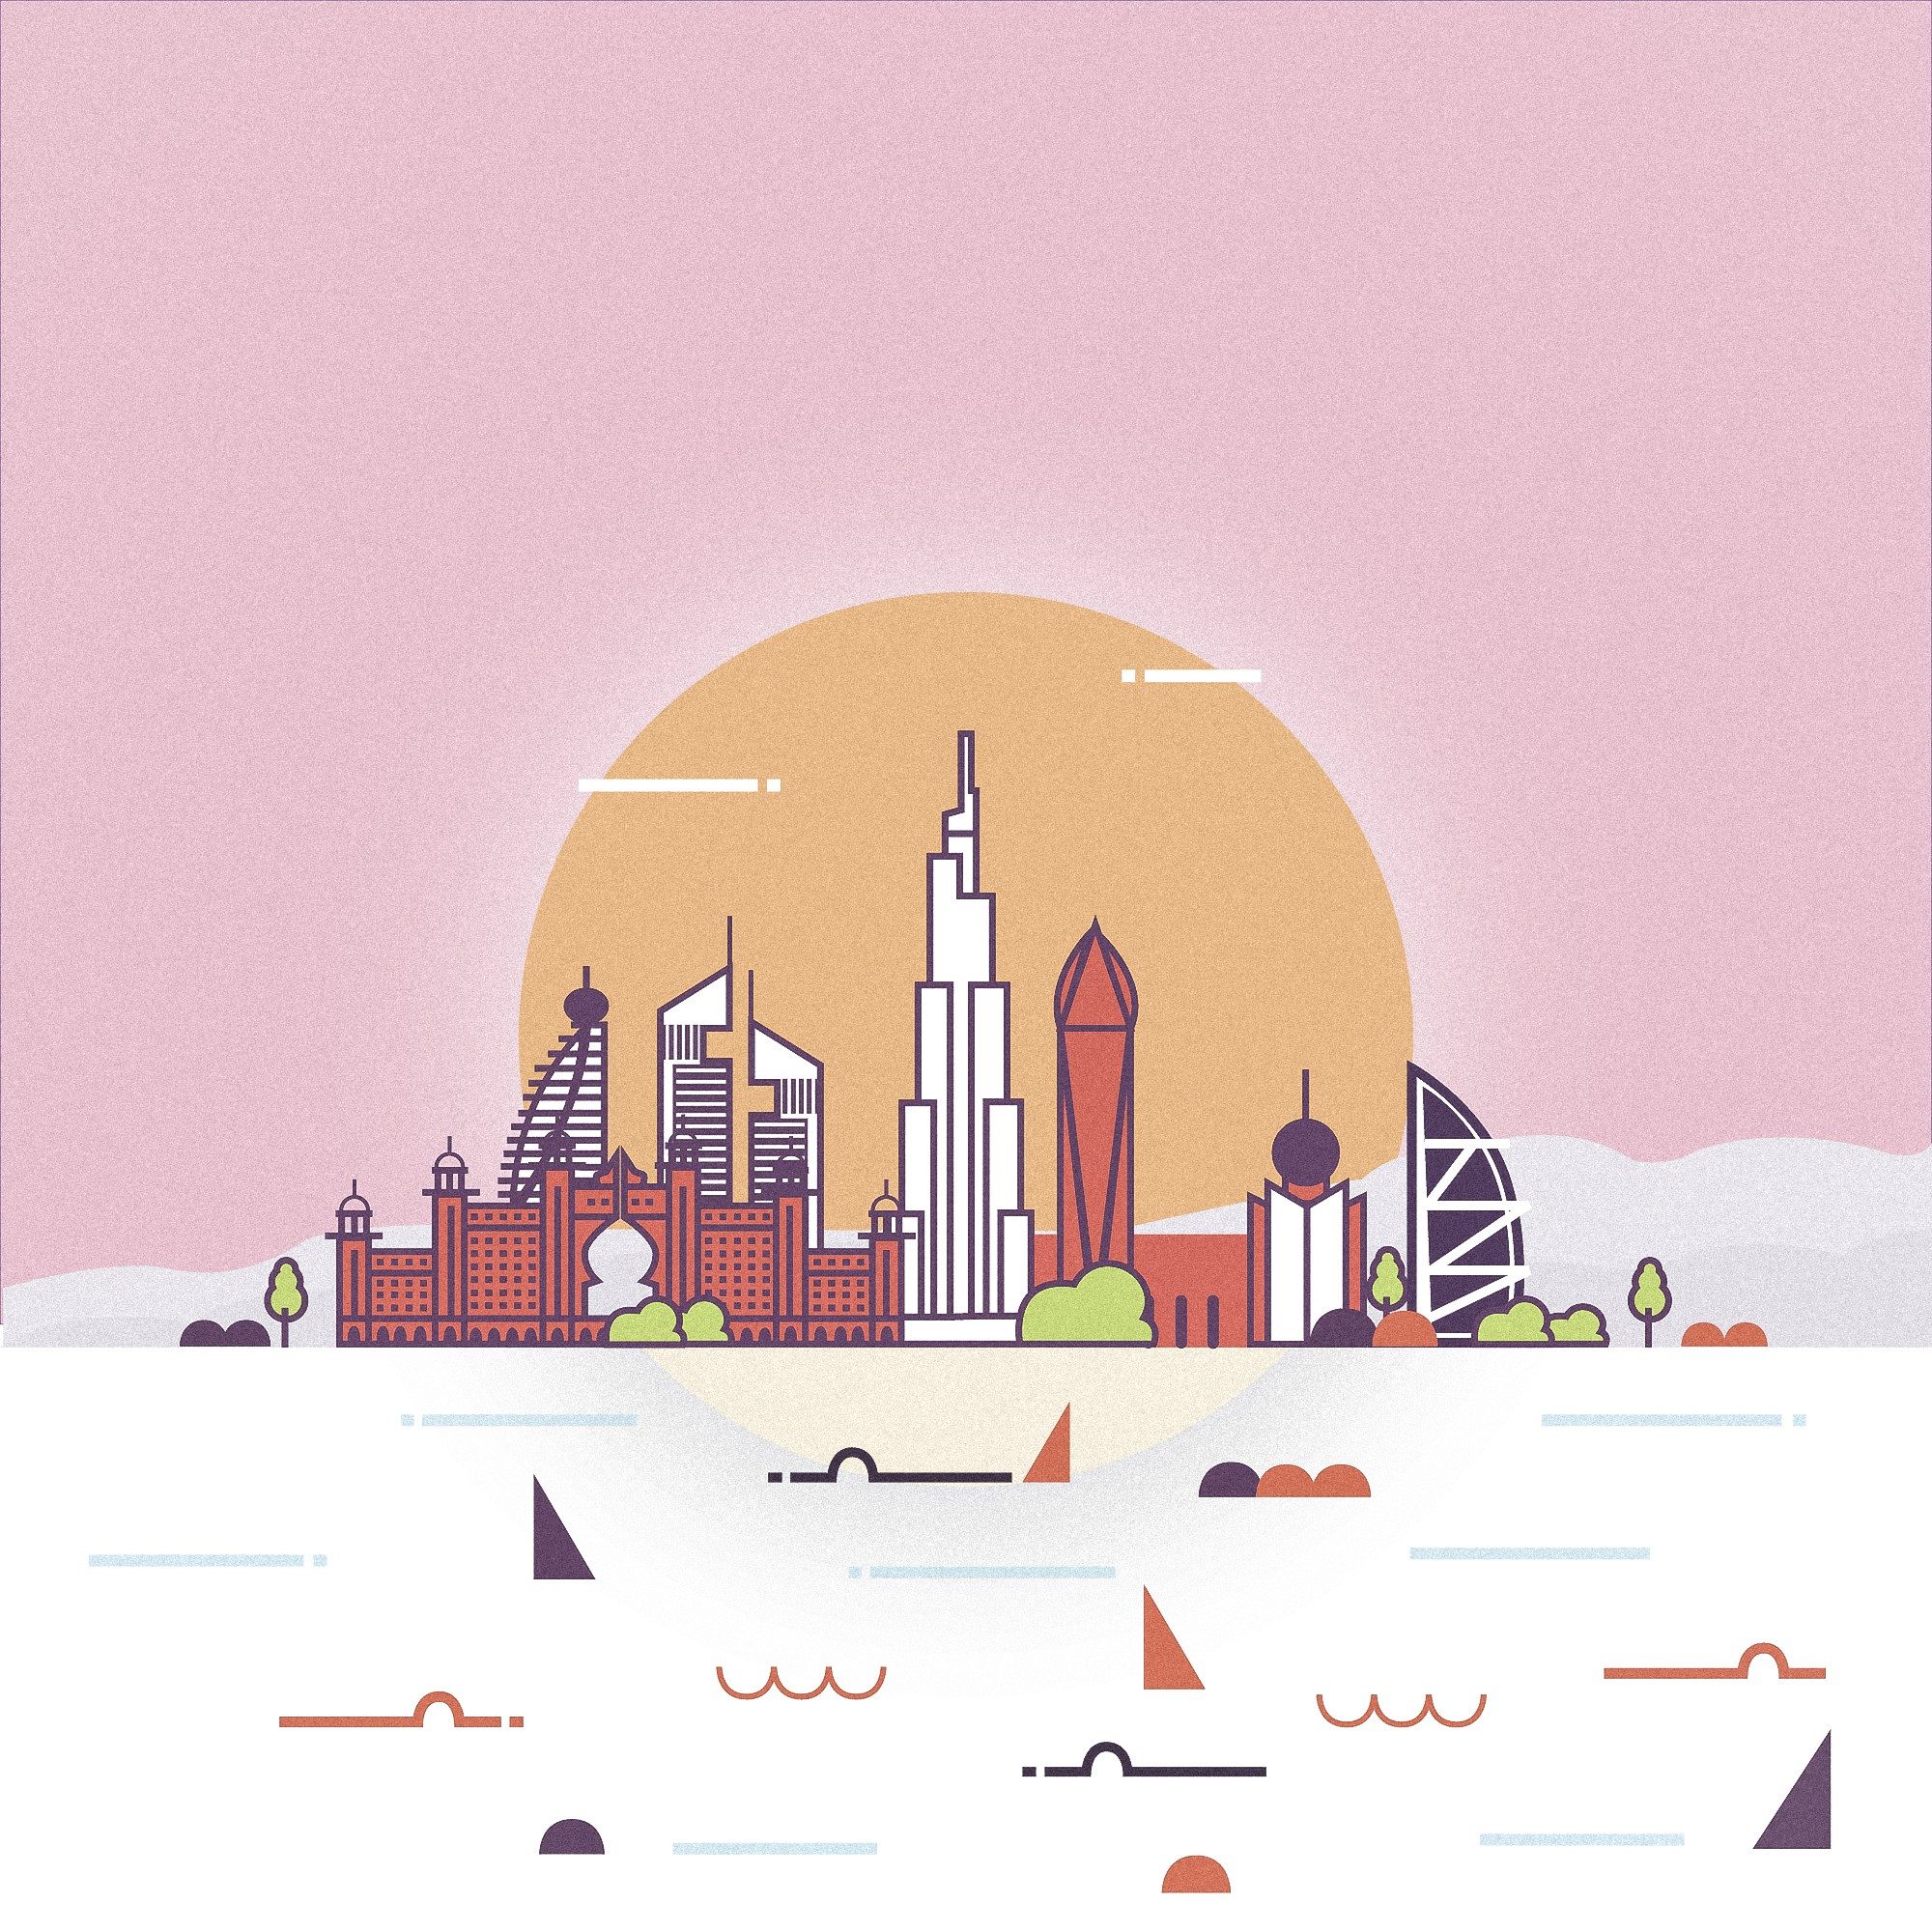 Cookie Tin design to be displayed at Dubai International Aiport